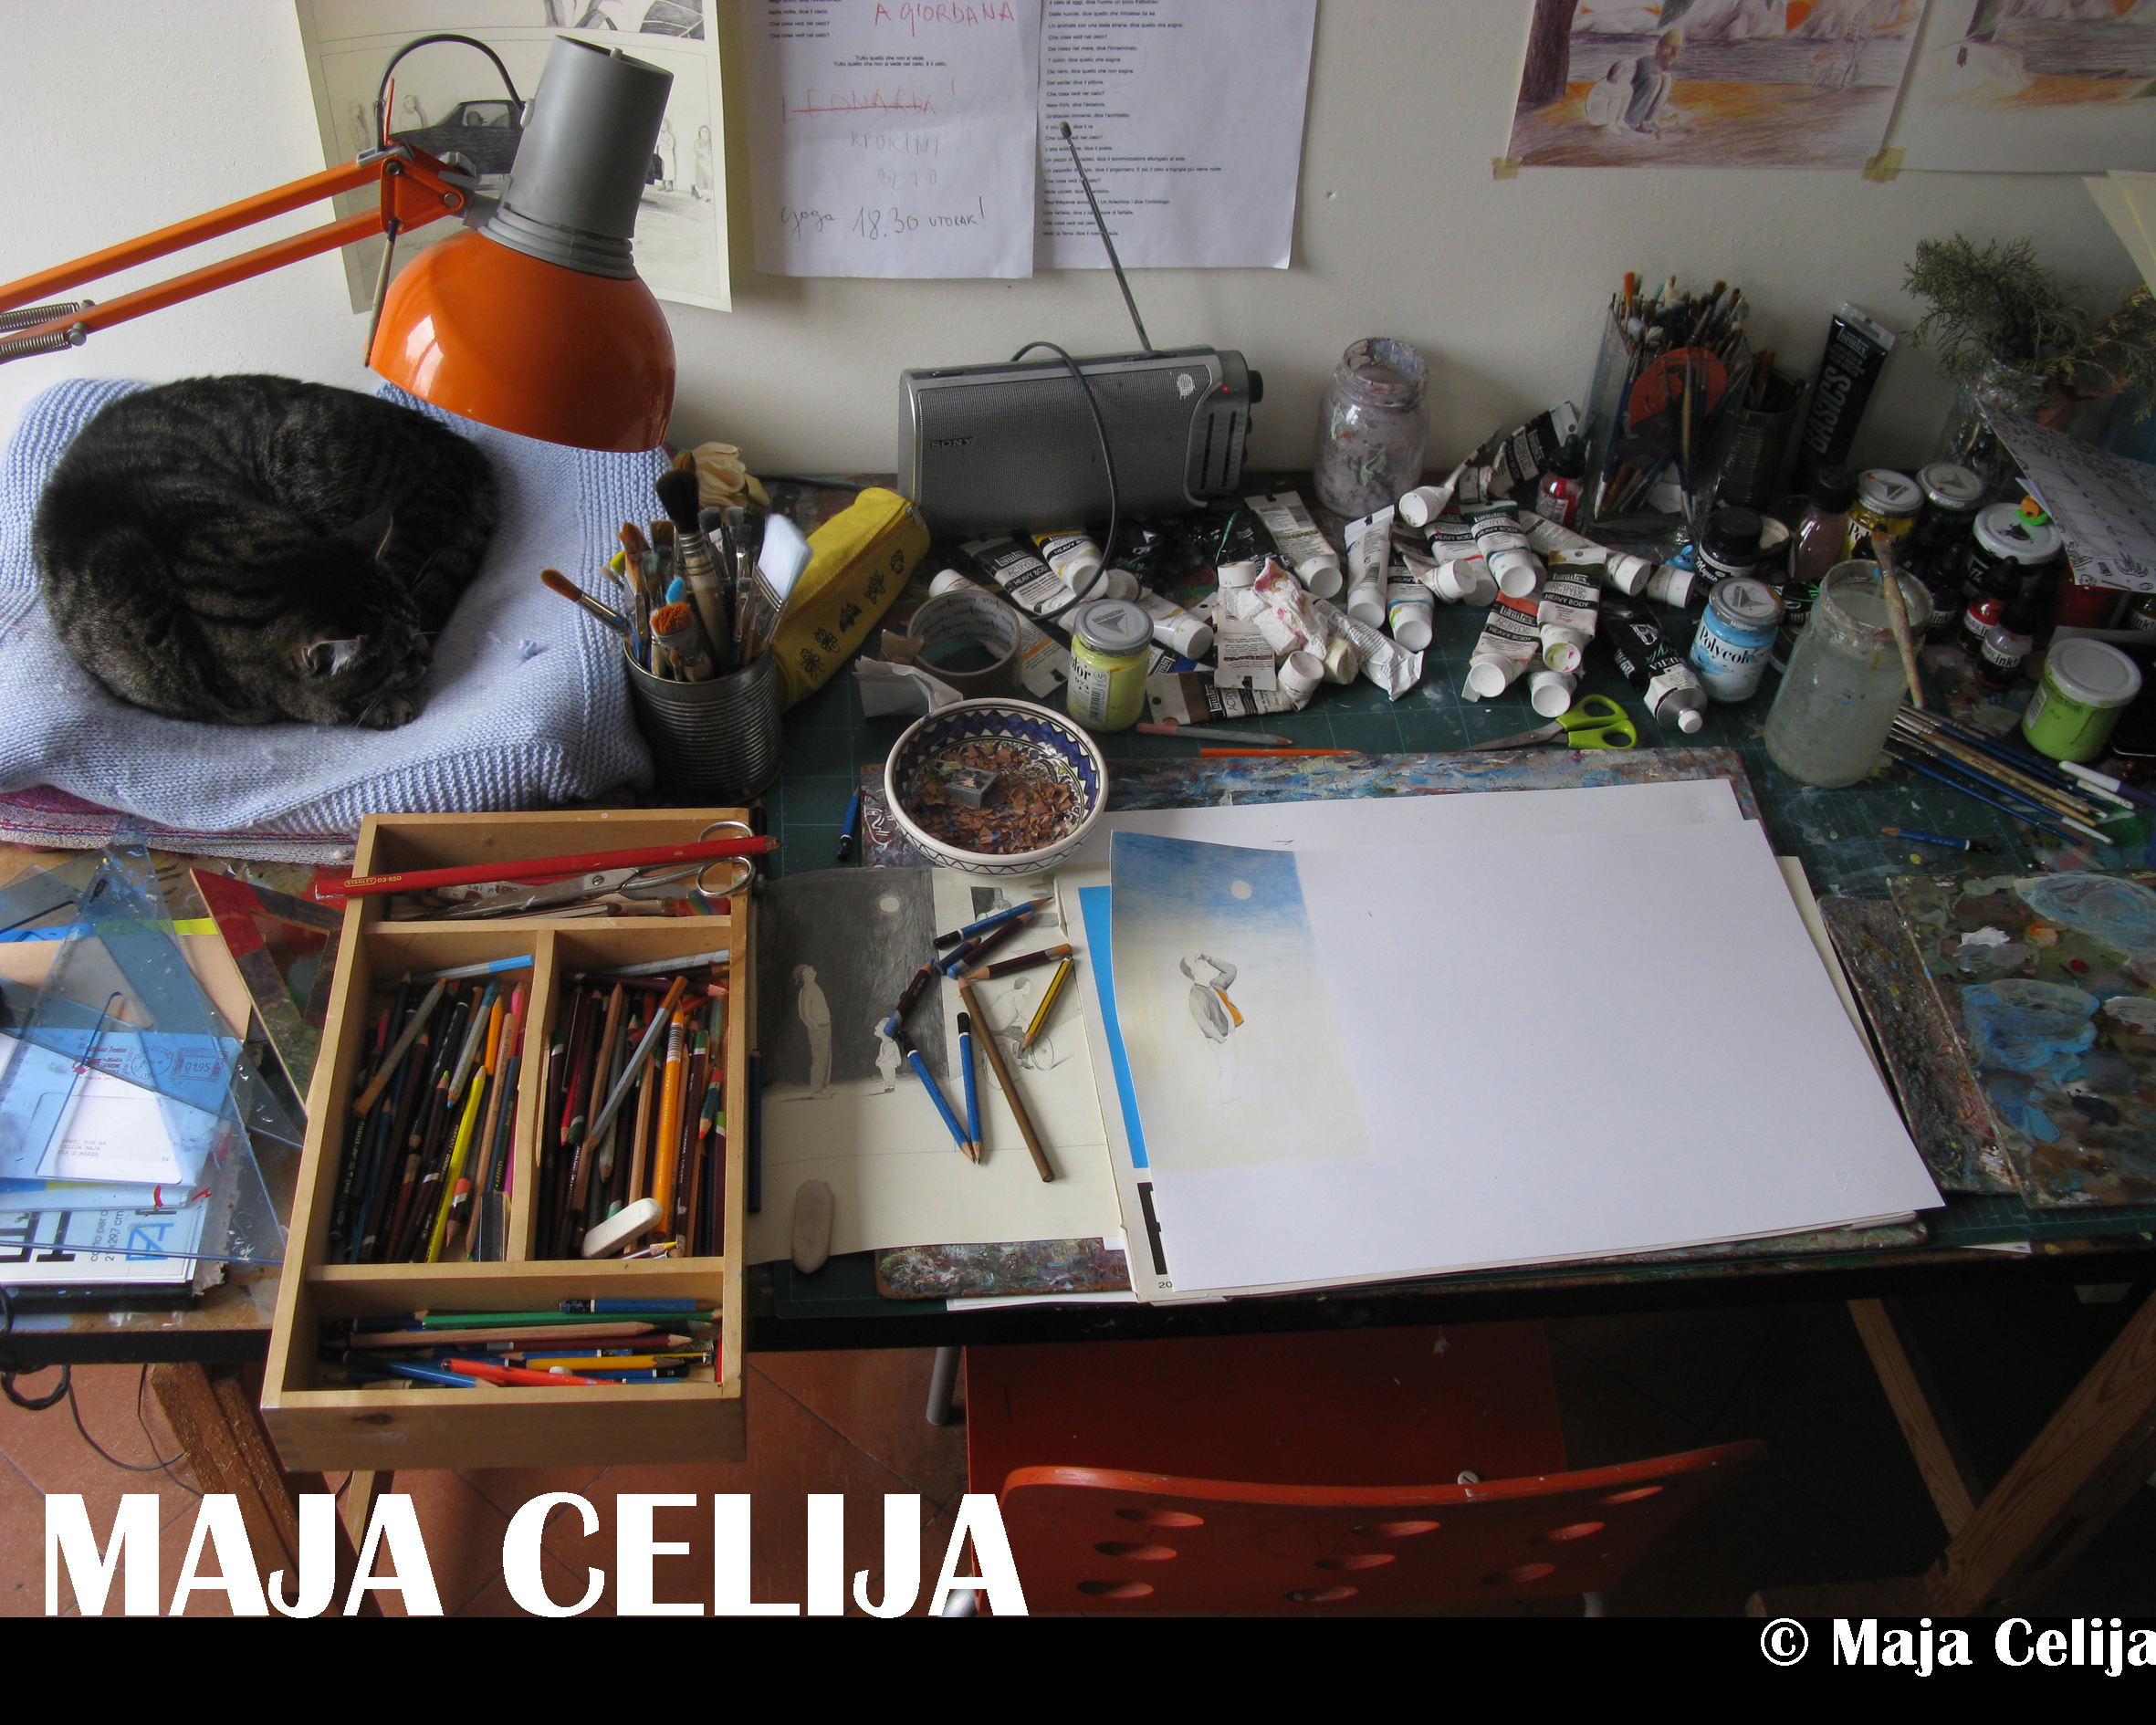 Maja Celija